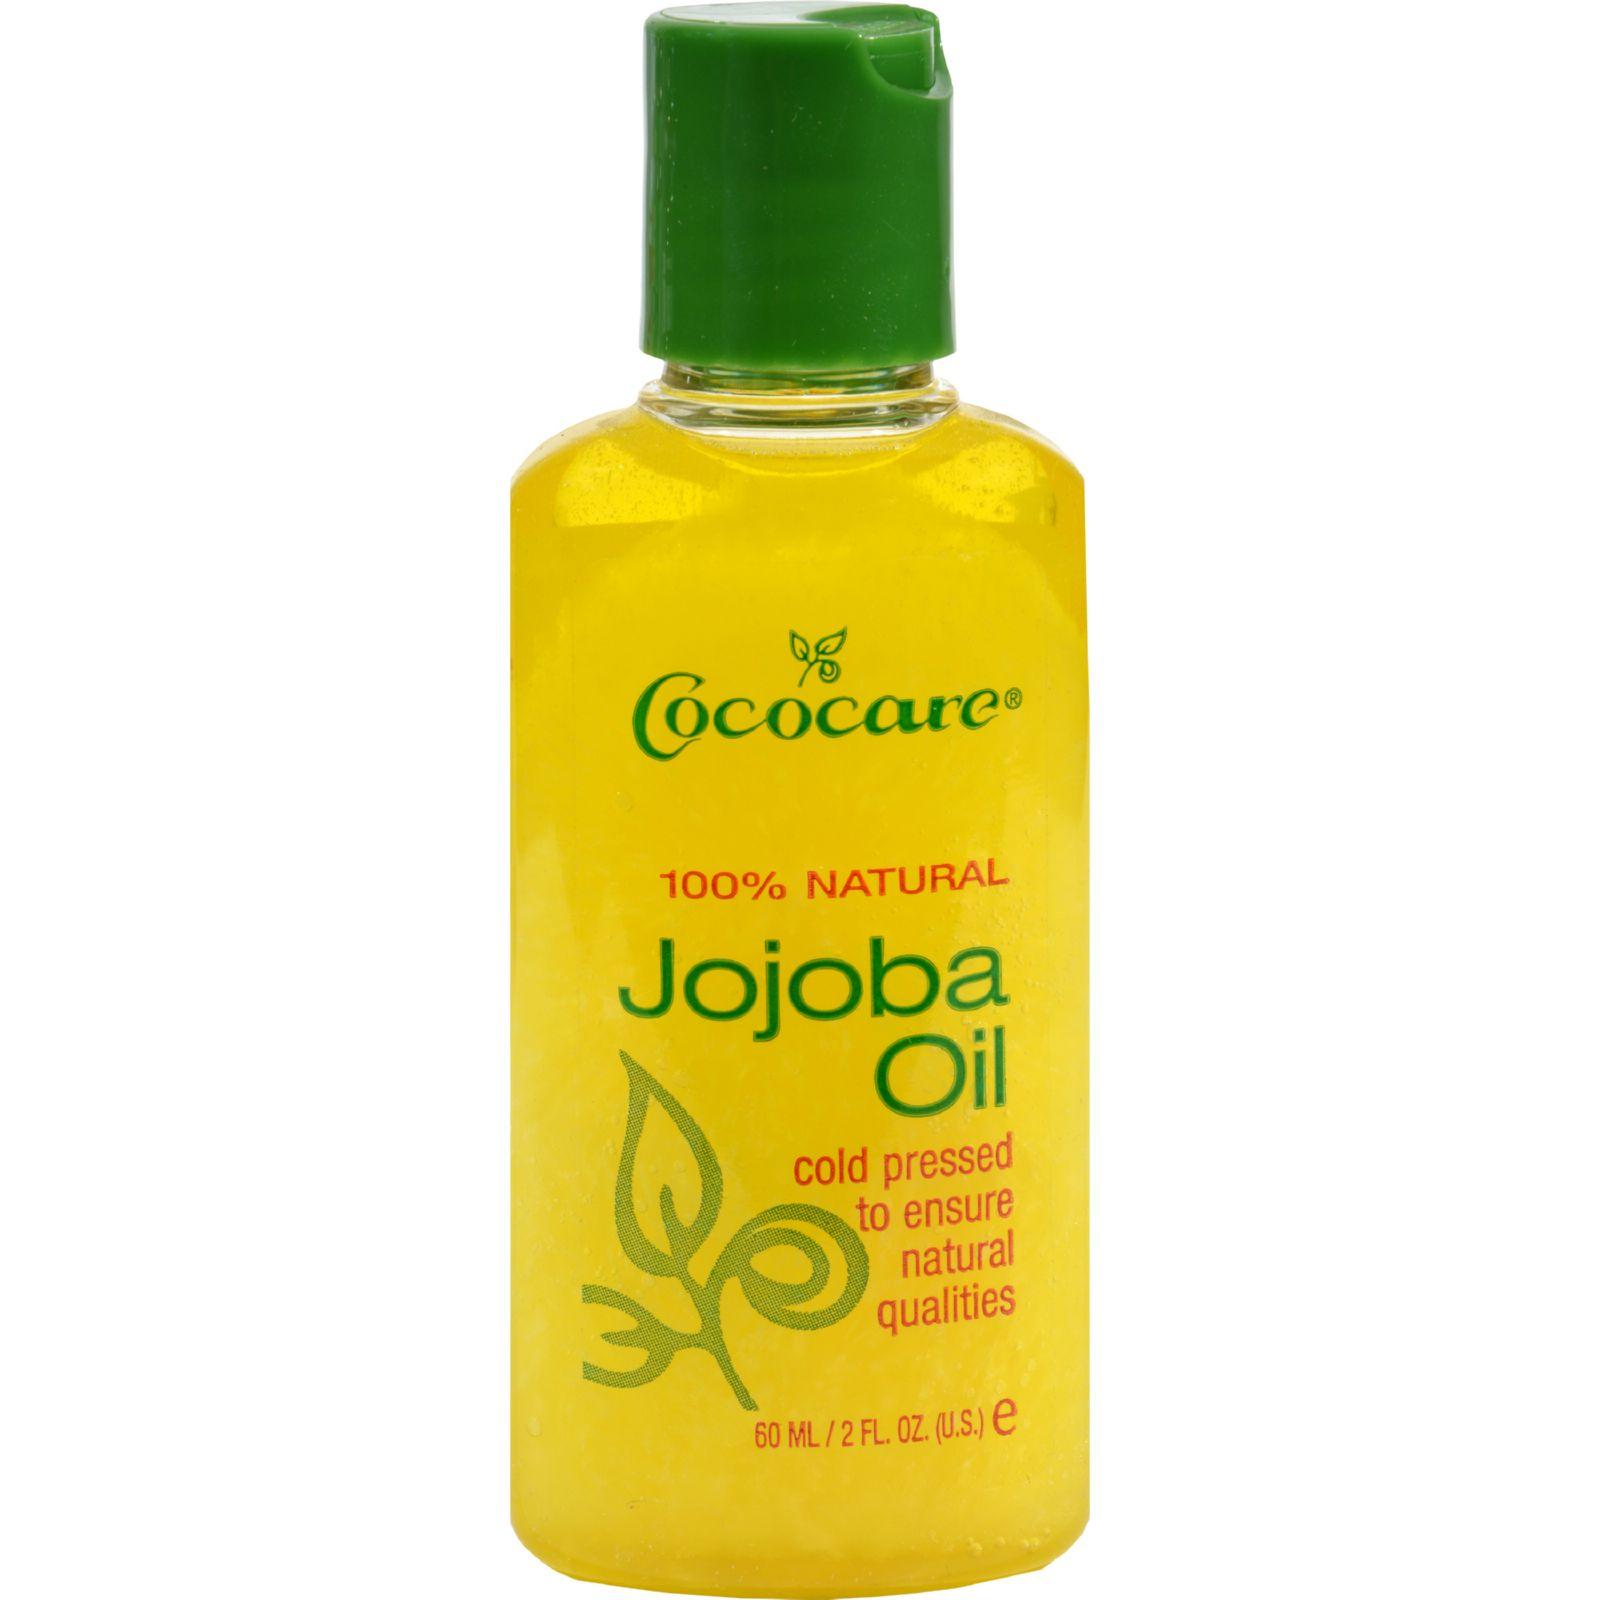 Cococare Natural Jojoba Oil -- 2 fl oz